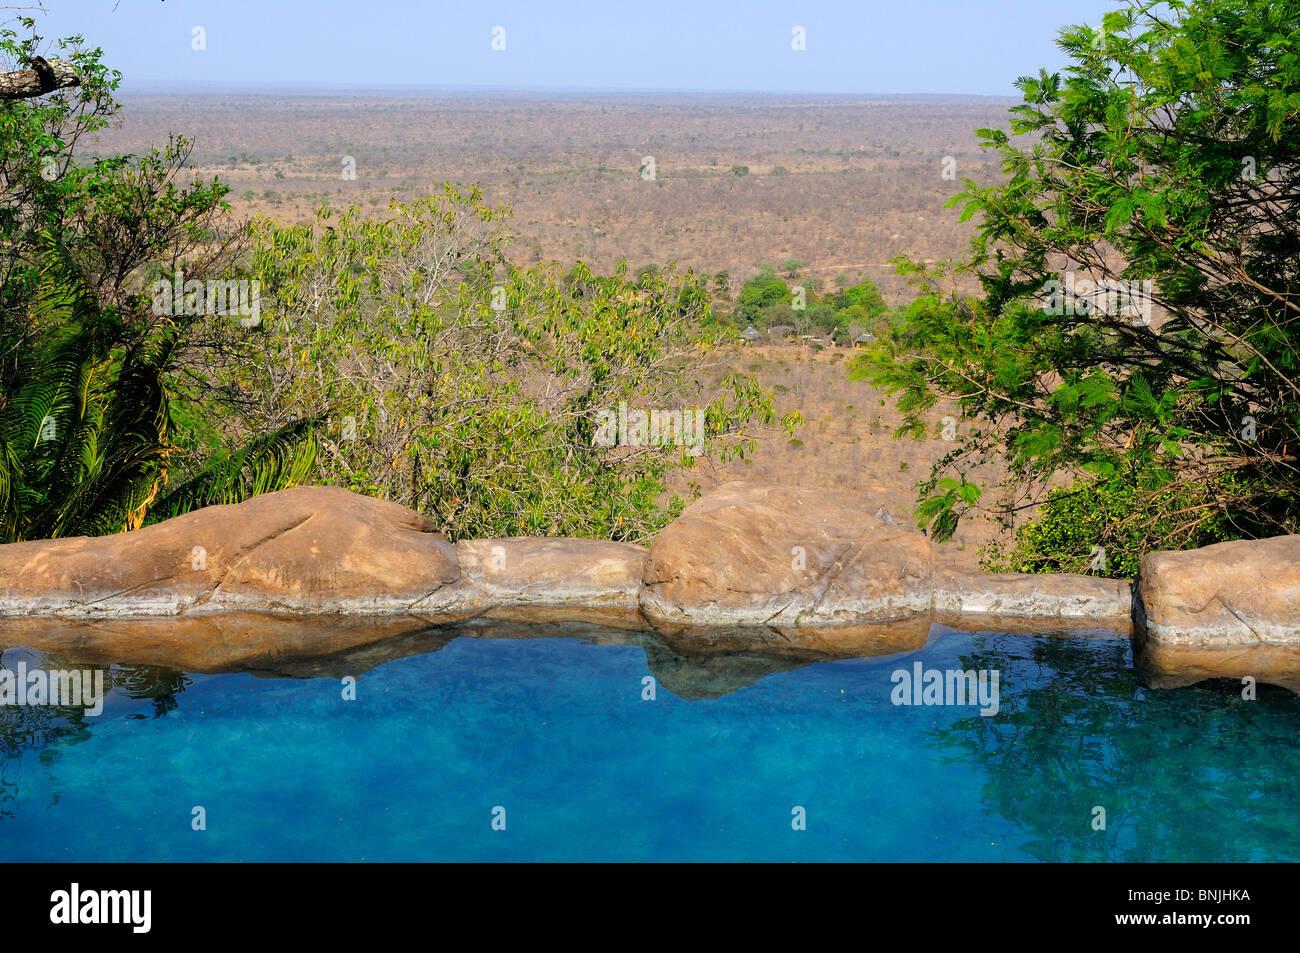 Pool Rock Lodge Ulusaba Sir Richard Branson's Private Game Reserve Sabi Sands Game Reserve Mpumalanga South Africa Stock Photo